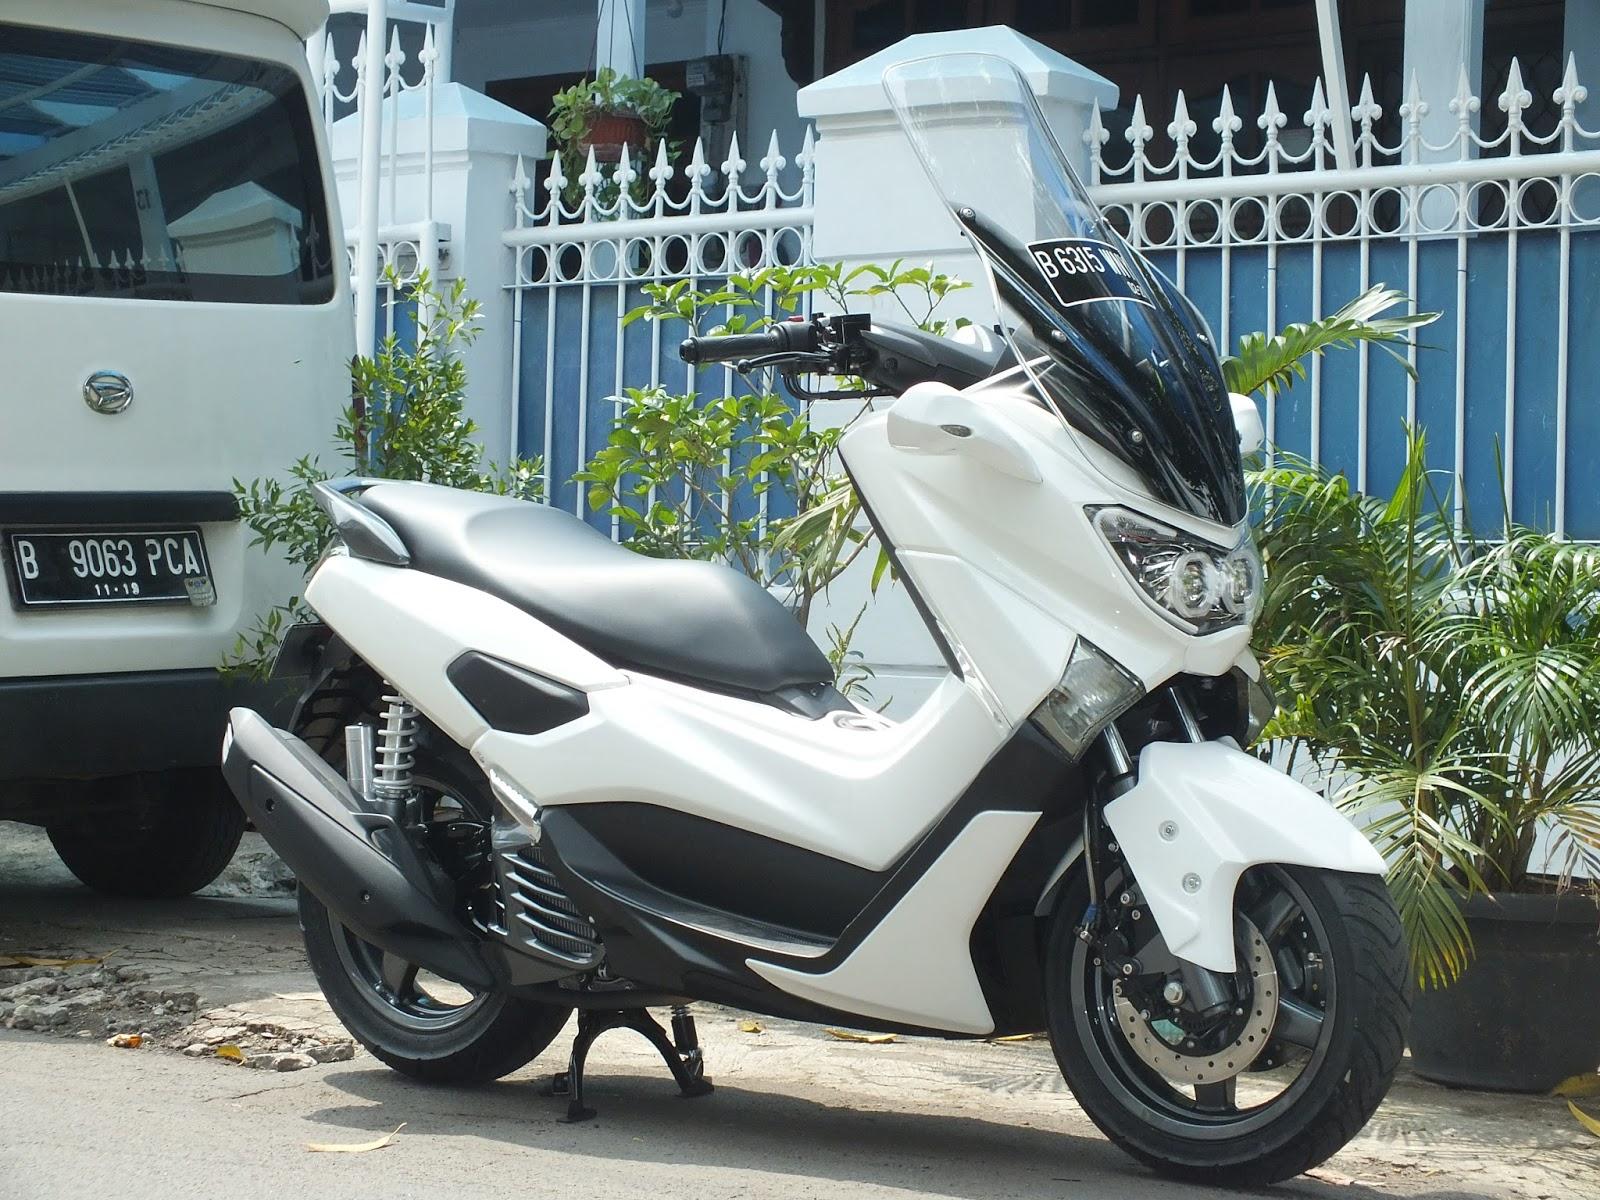 50 Modifikasi Yamaha Nmax Warna Putih Modifikasi Yamah Nmax